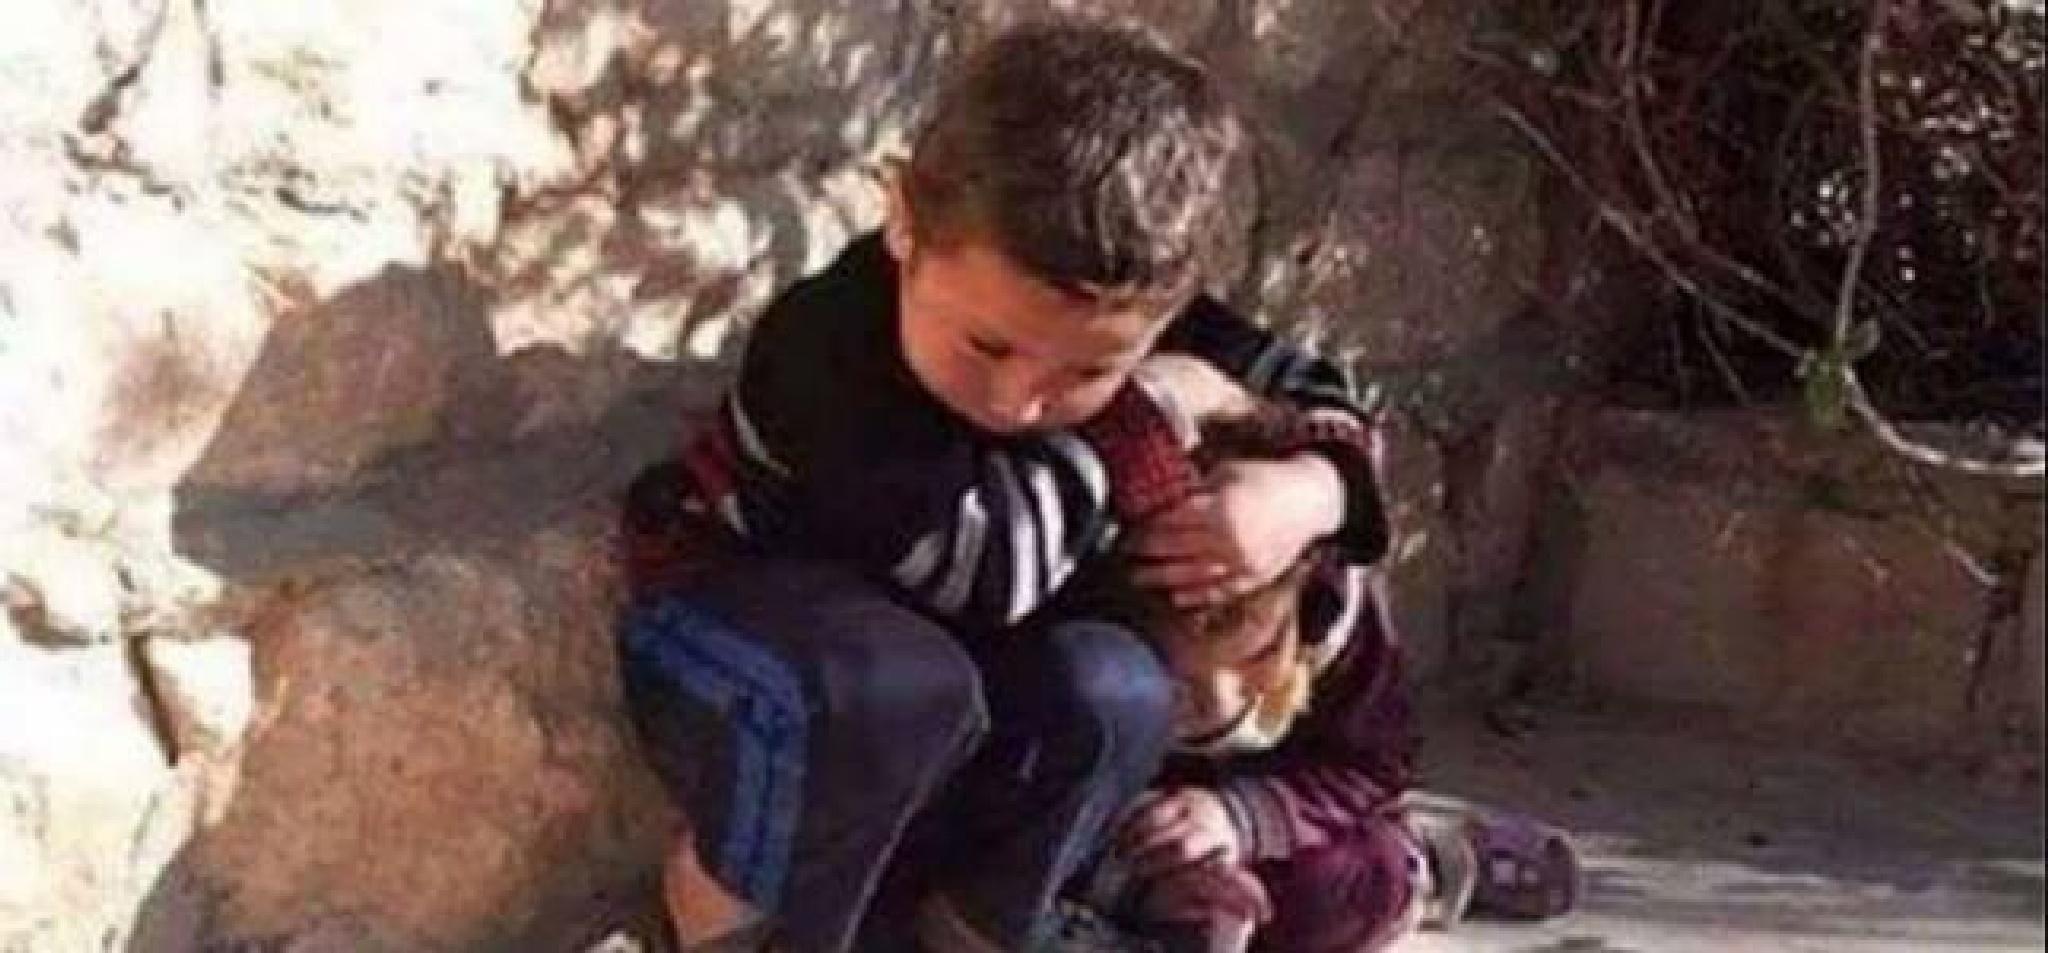 Syria Kids by Mourad Ferhi